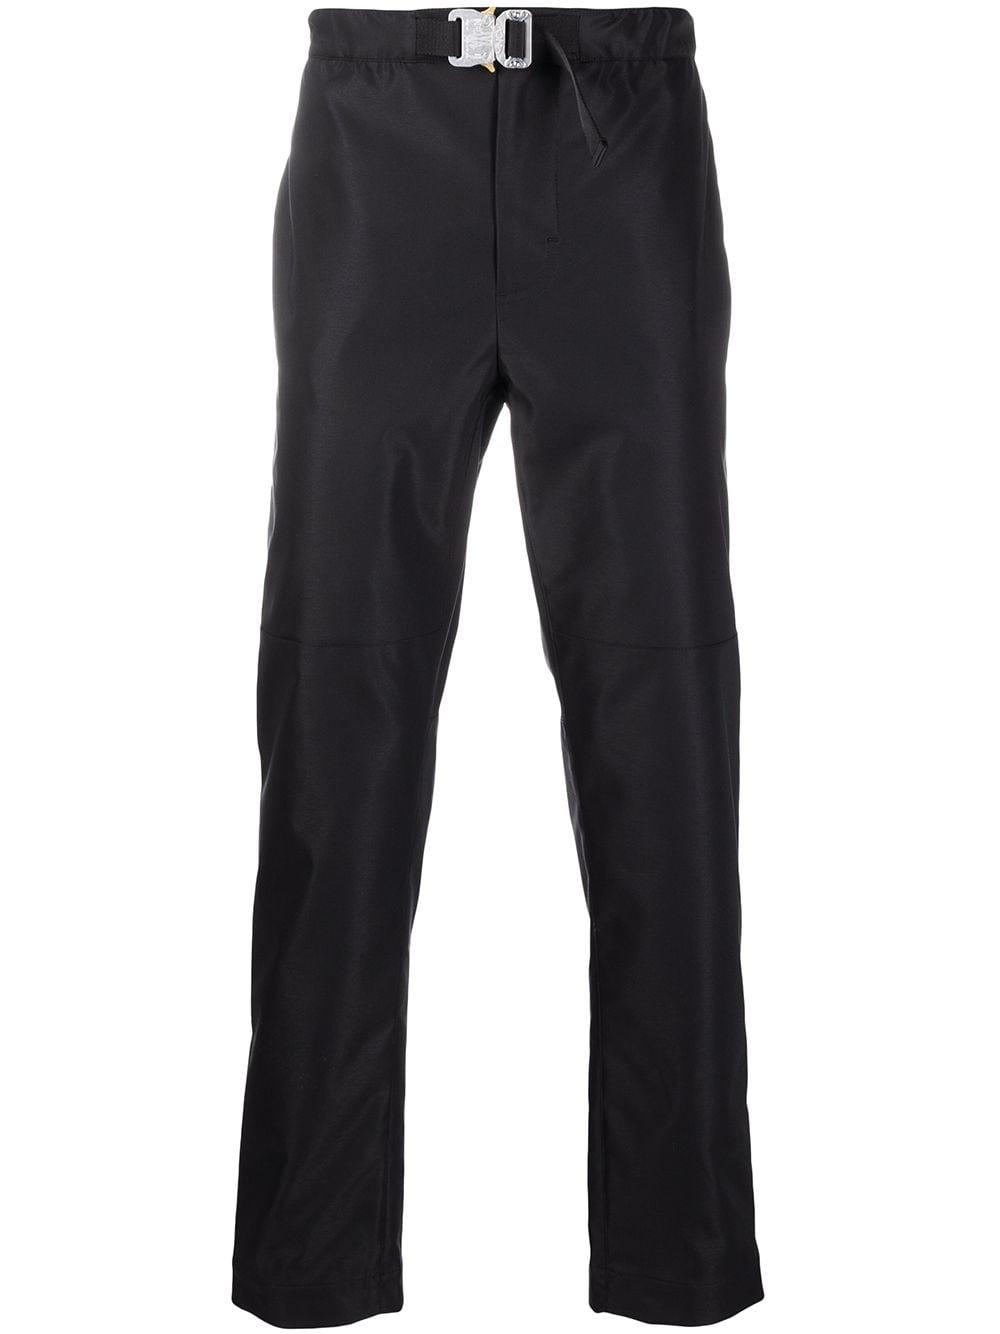 Pantaloni neri a gamba dritta Moncler Genius con chiusura con fibbia MONCLER GENIUS | Pantaloni | 2A701-00-54AD1999